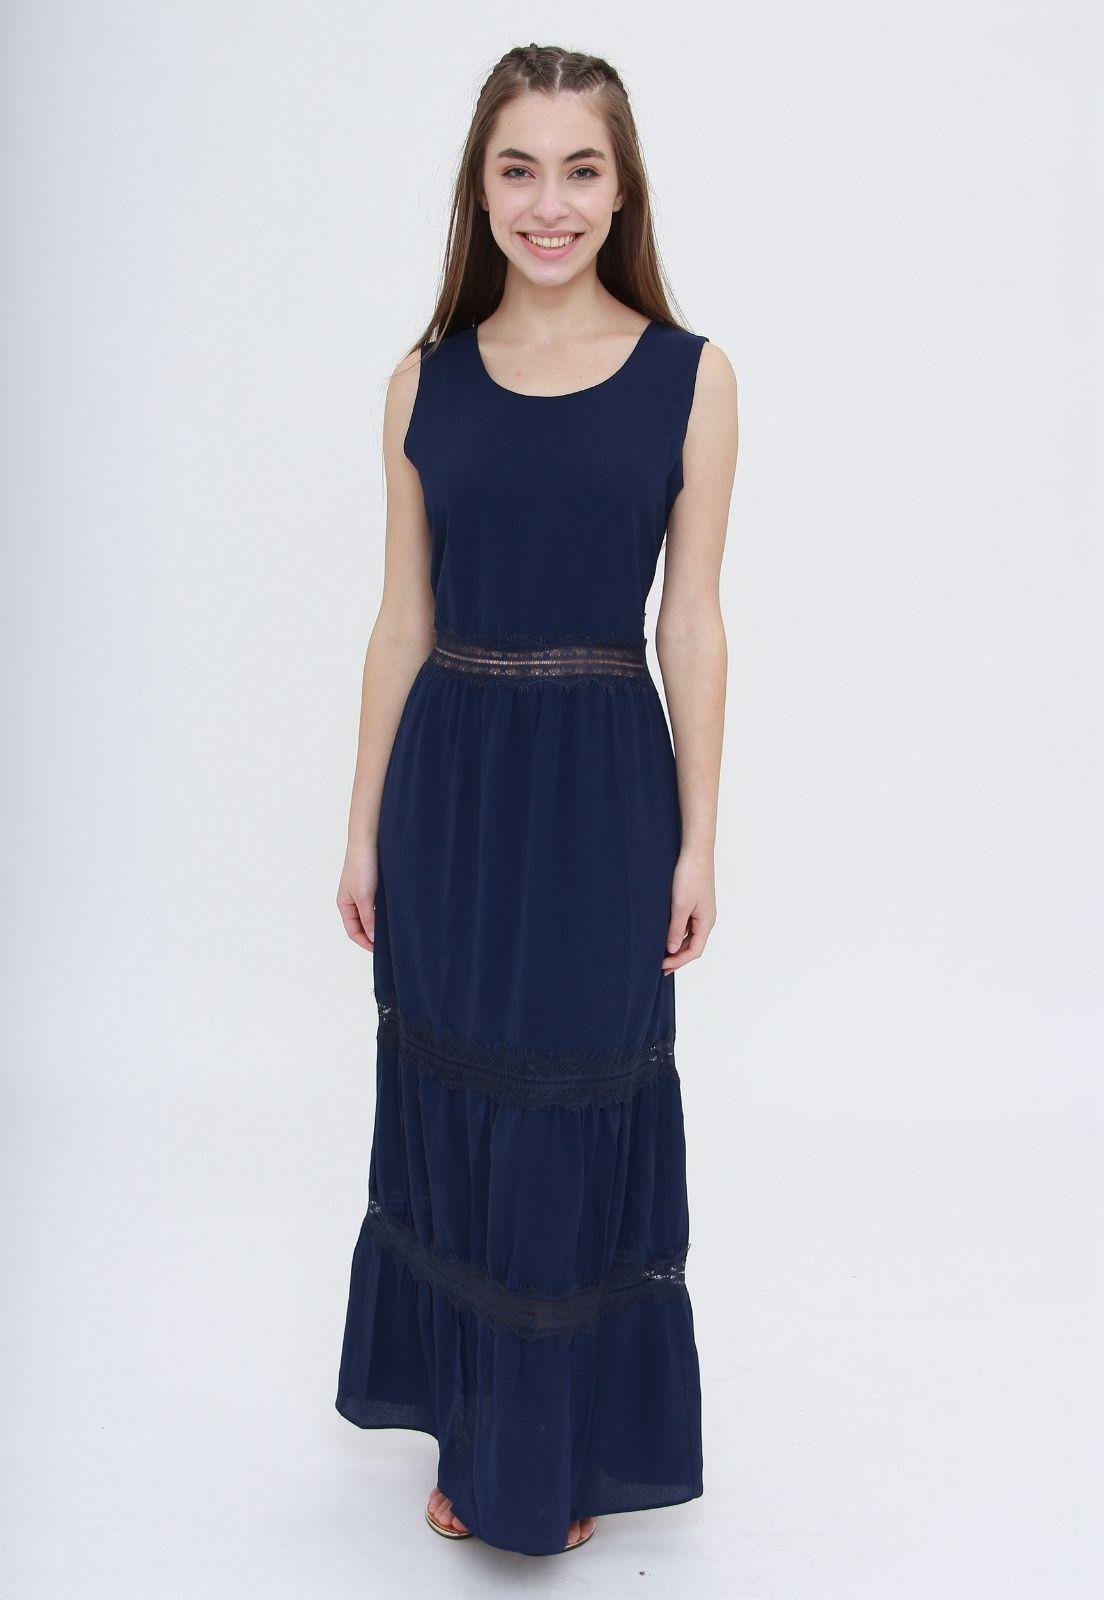 Vestido Longo Trabuca Azul  - Metro & Co.